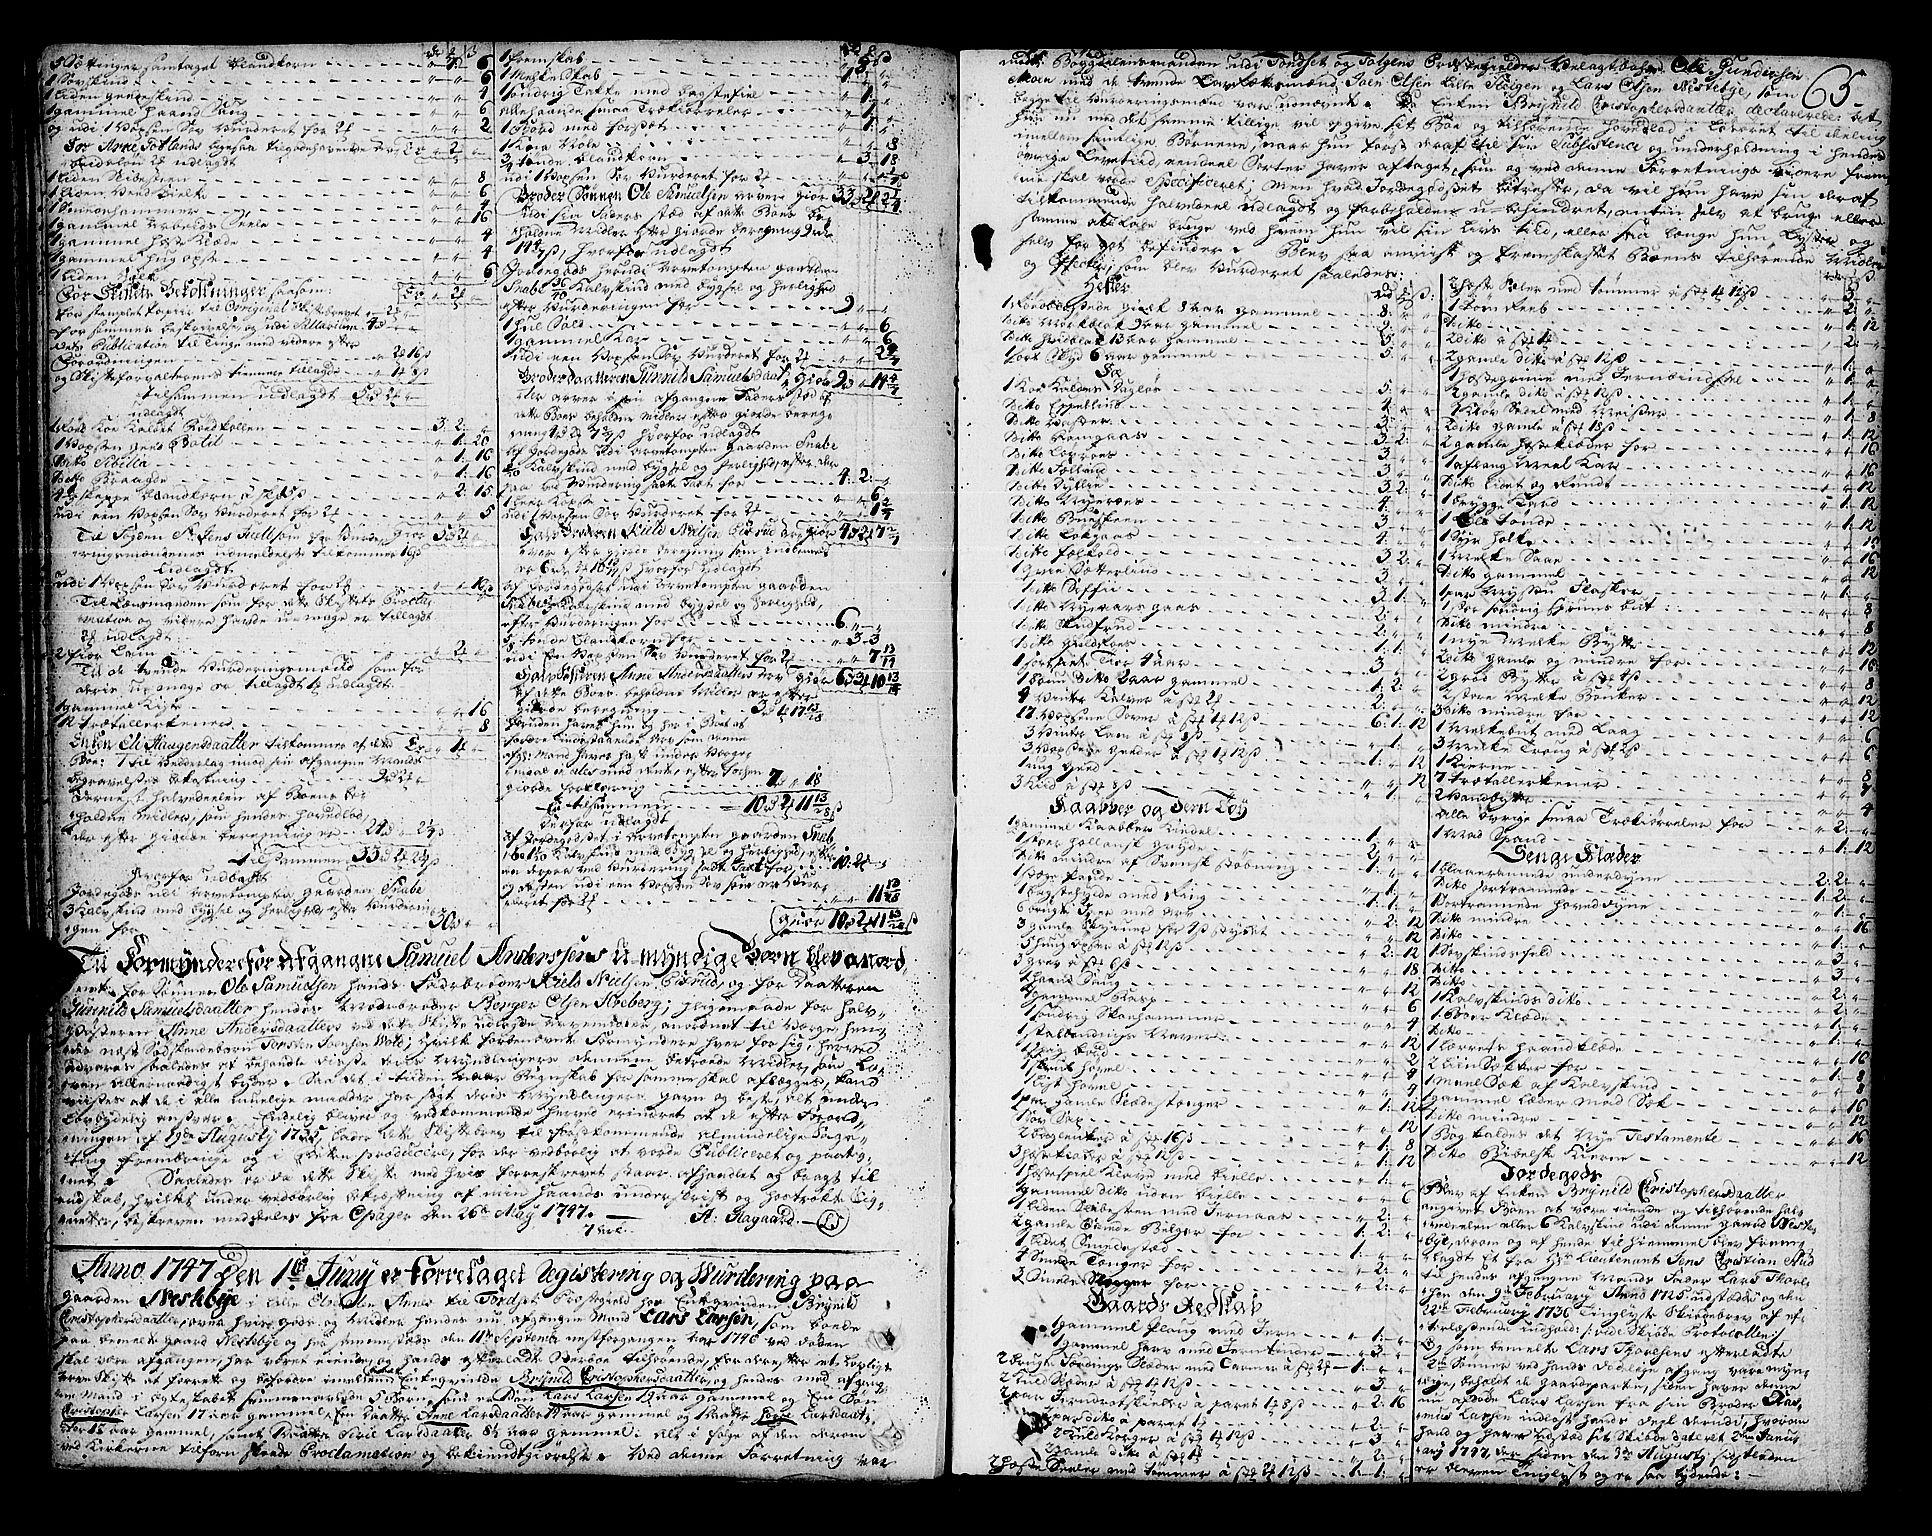 SAH, Solør og Østerdalen sorenskriveri, J/Ja/L0009A: Skifteprotokoll, 1747-1750, s. 64b-65a